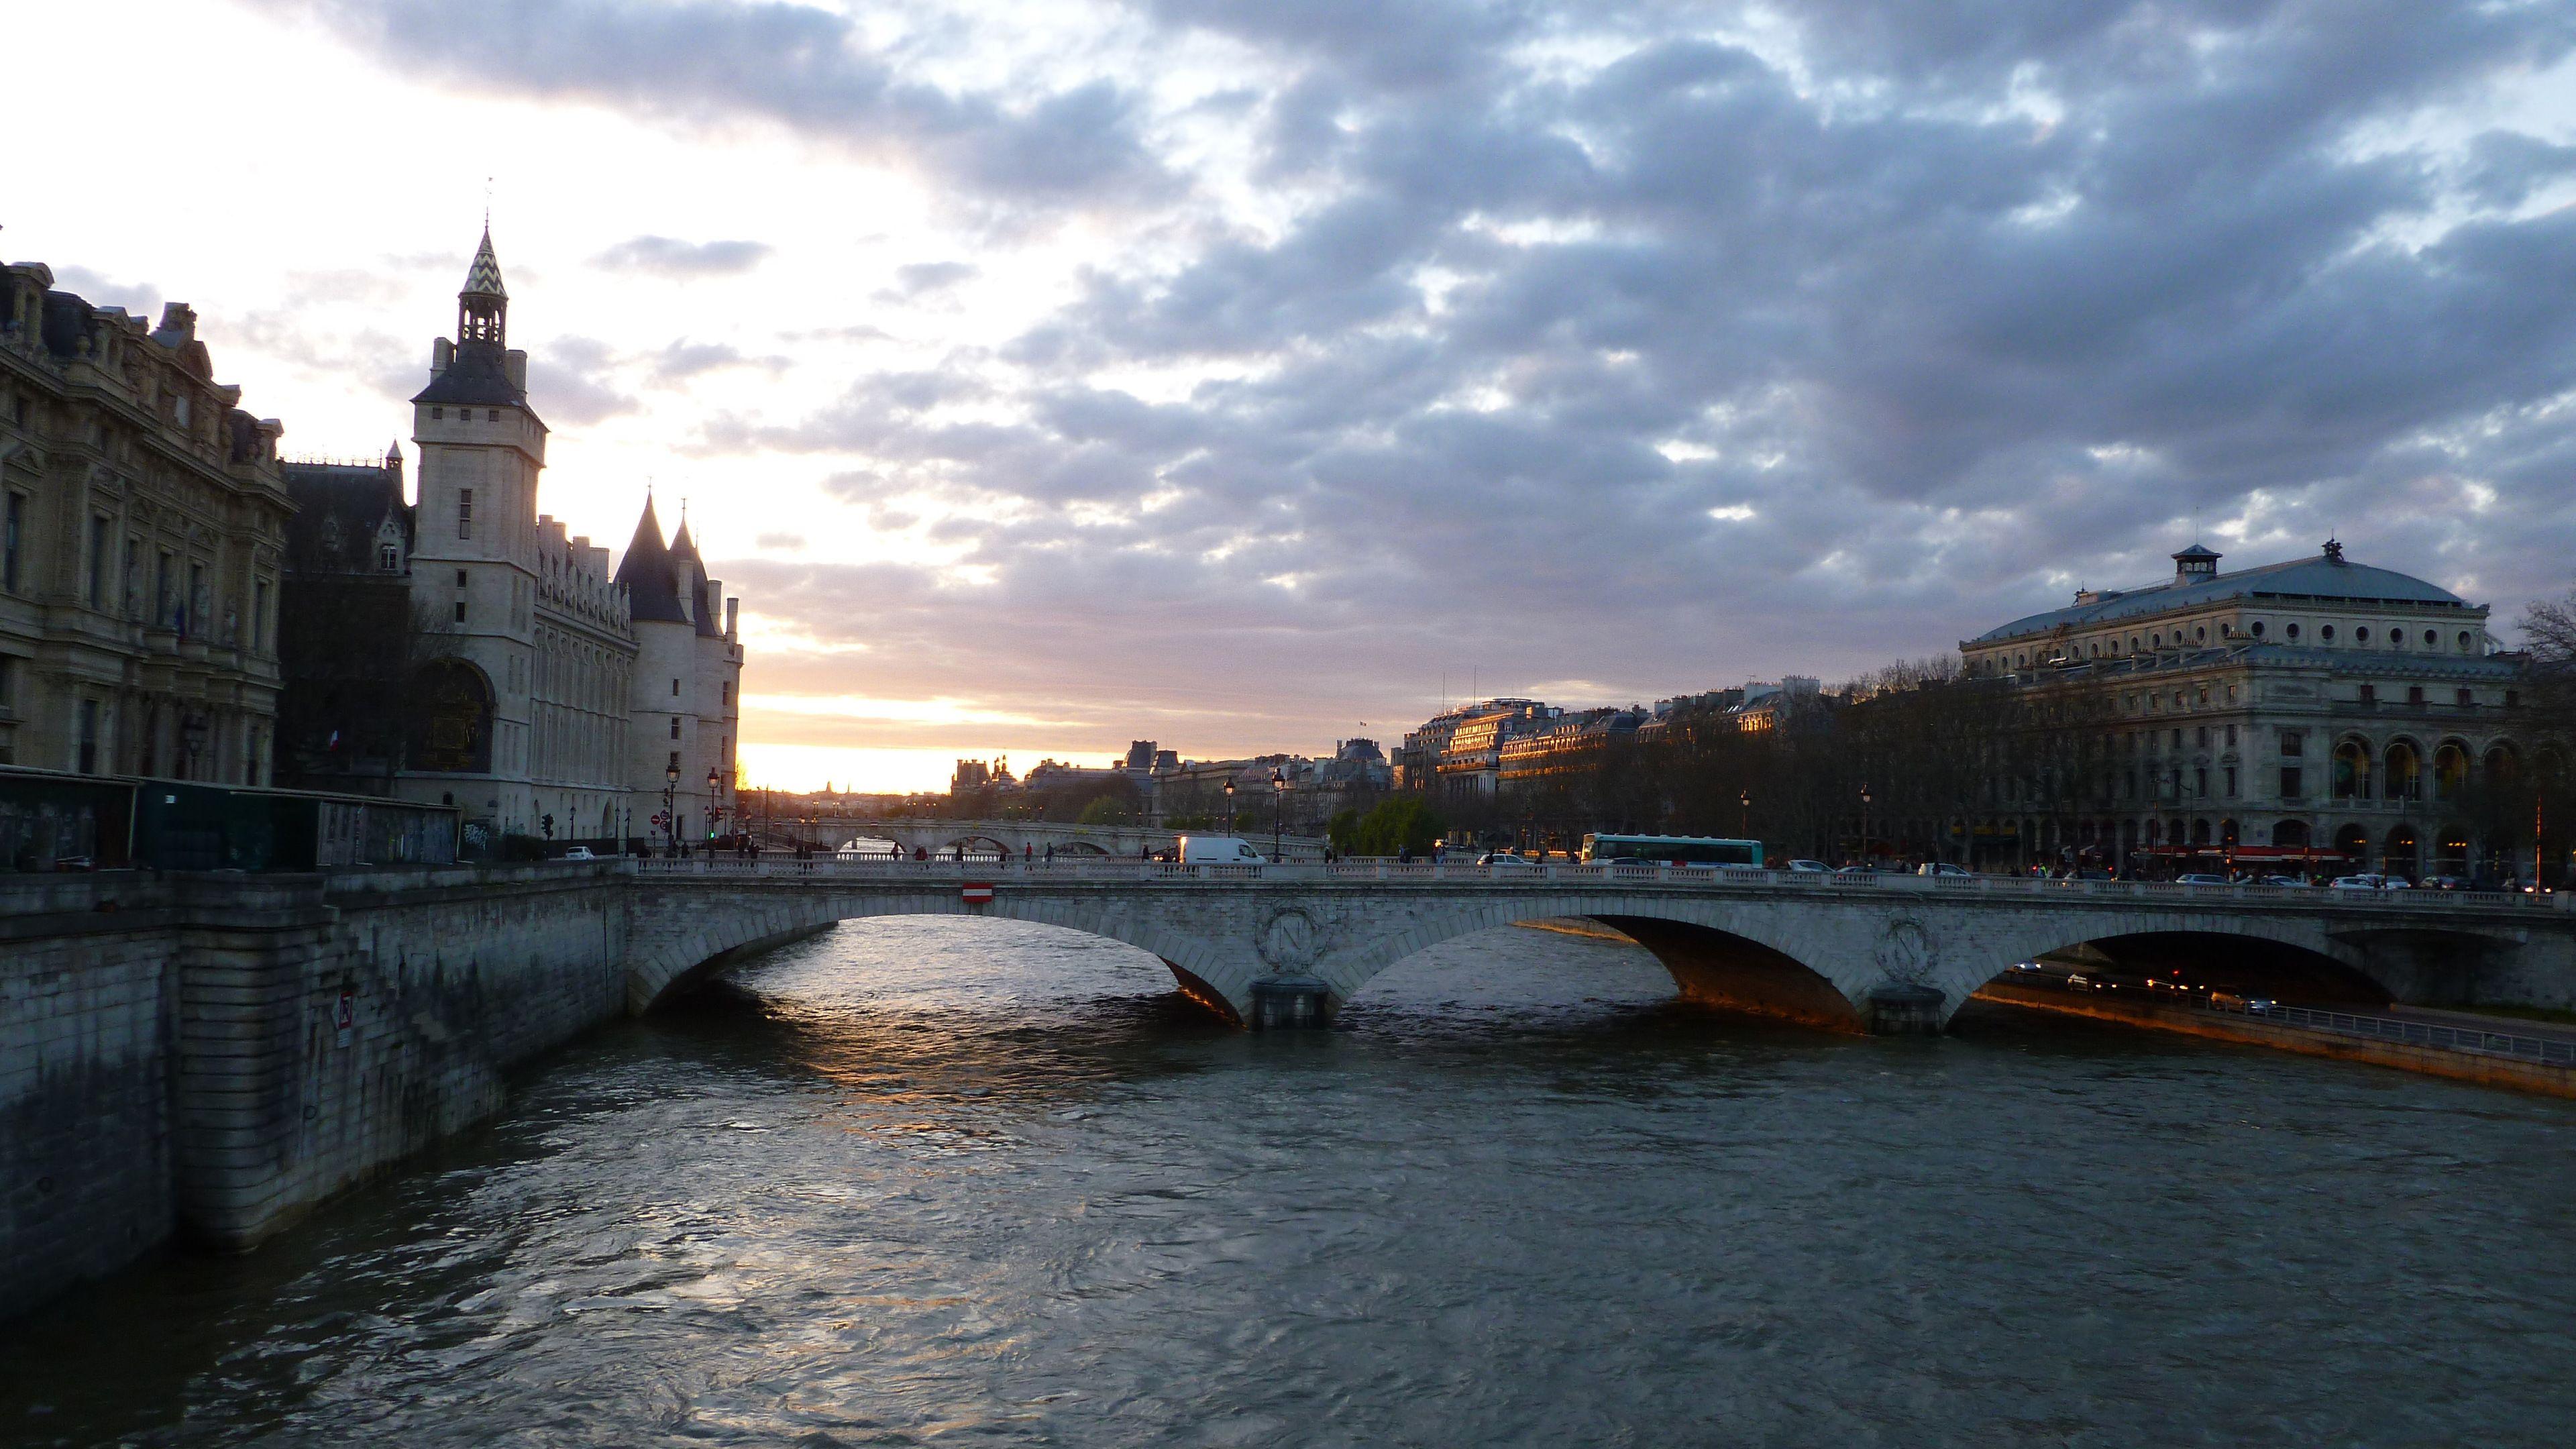 Conciergerie and the River Seine in Paris